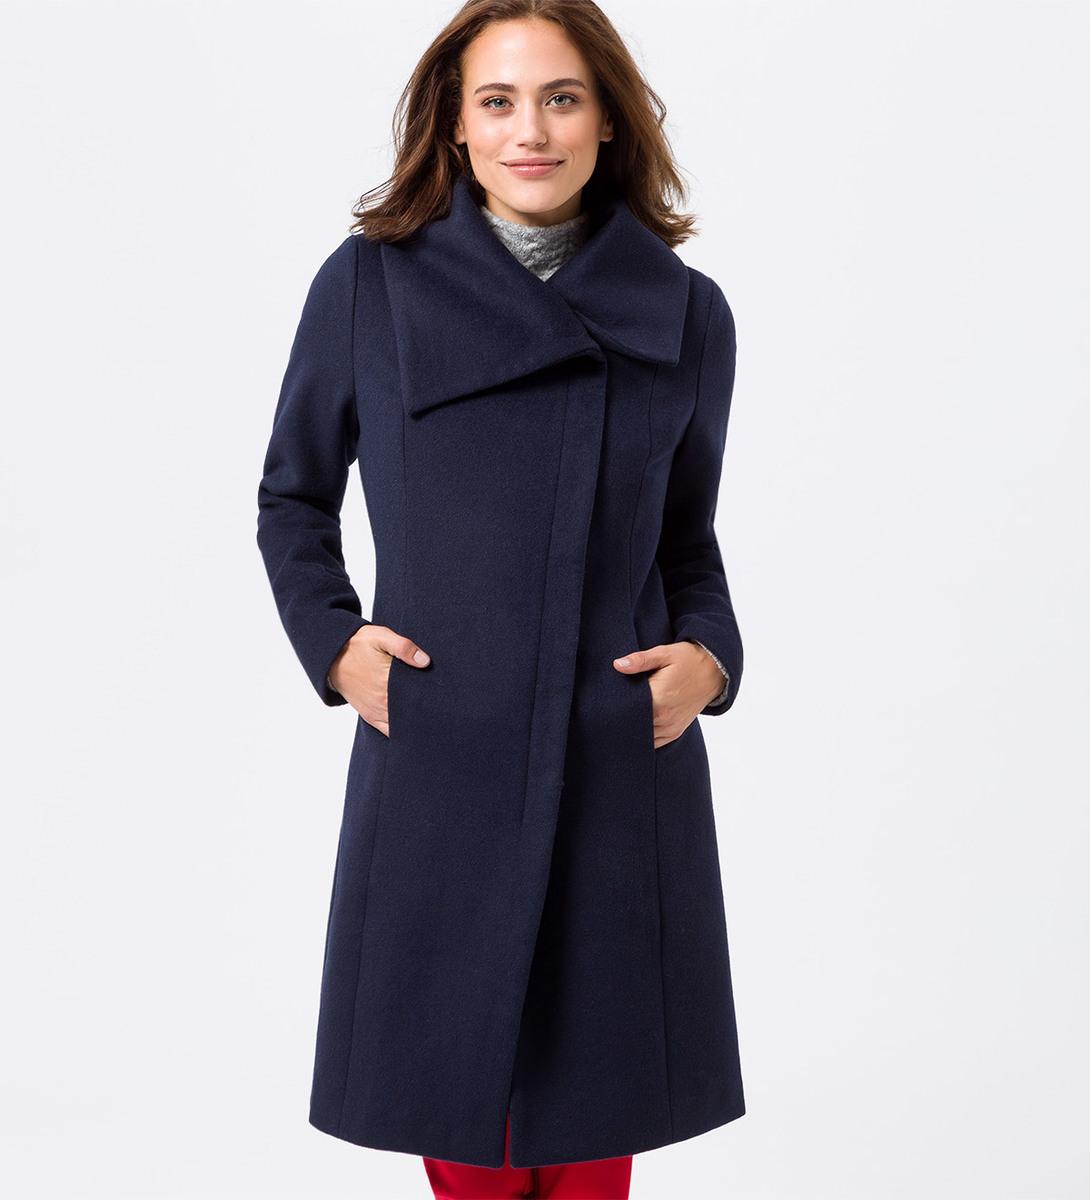 Mantel mit Wolle in blue black